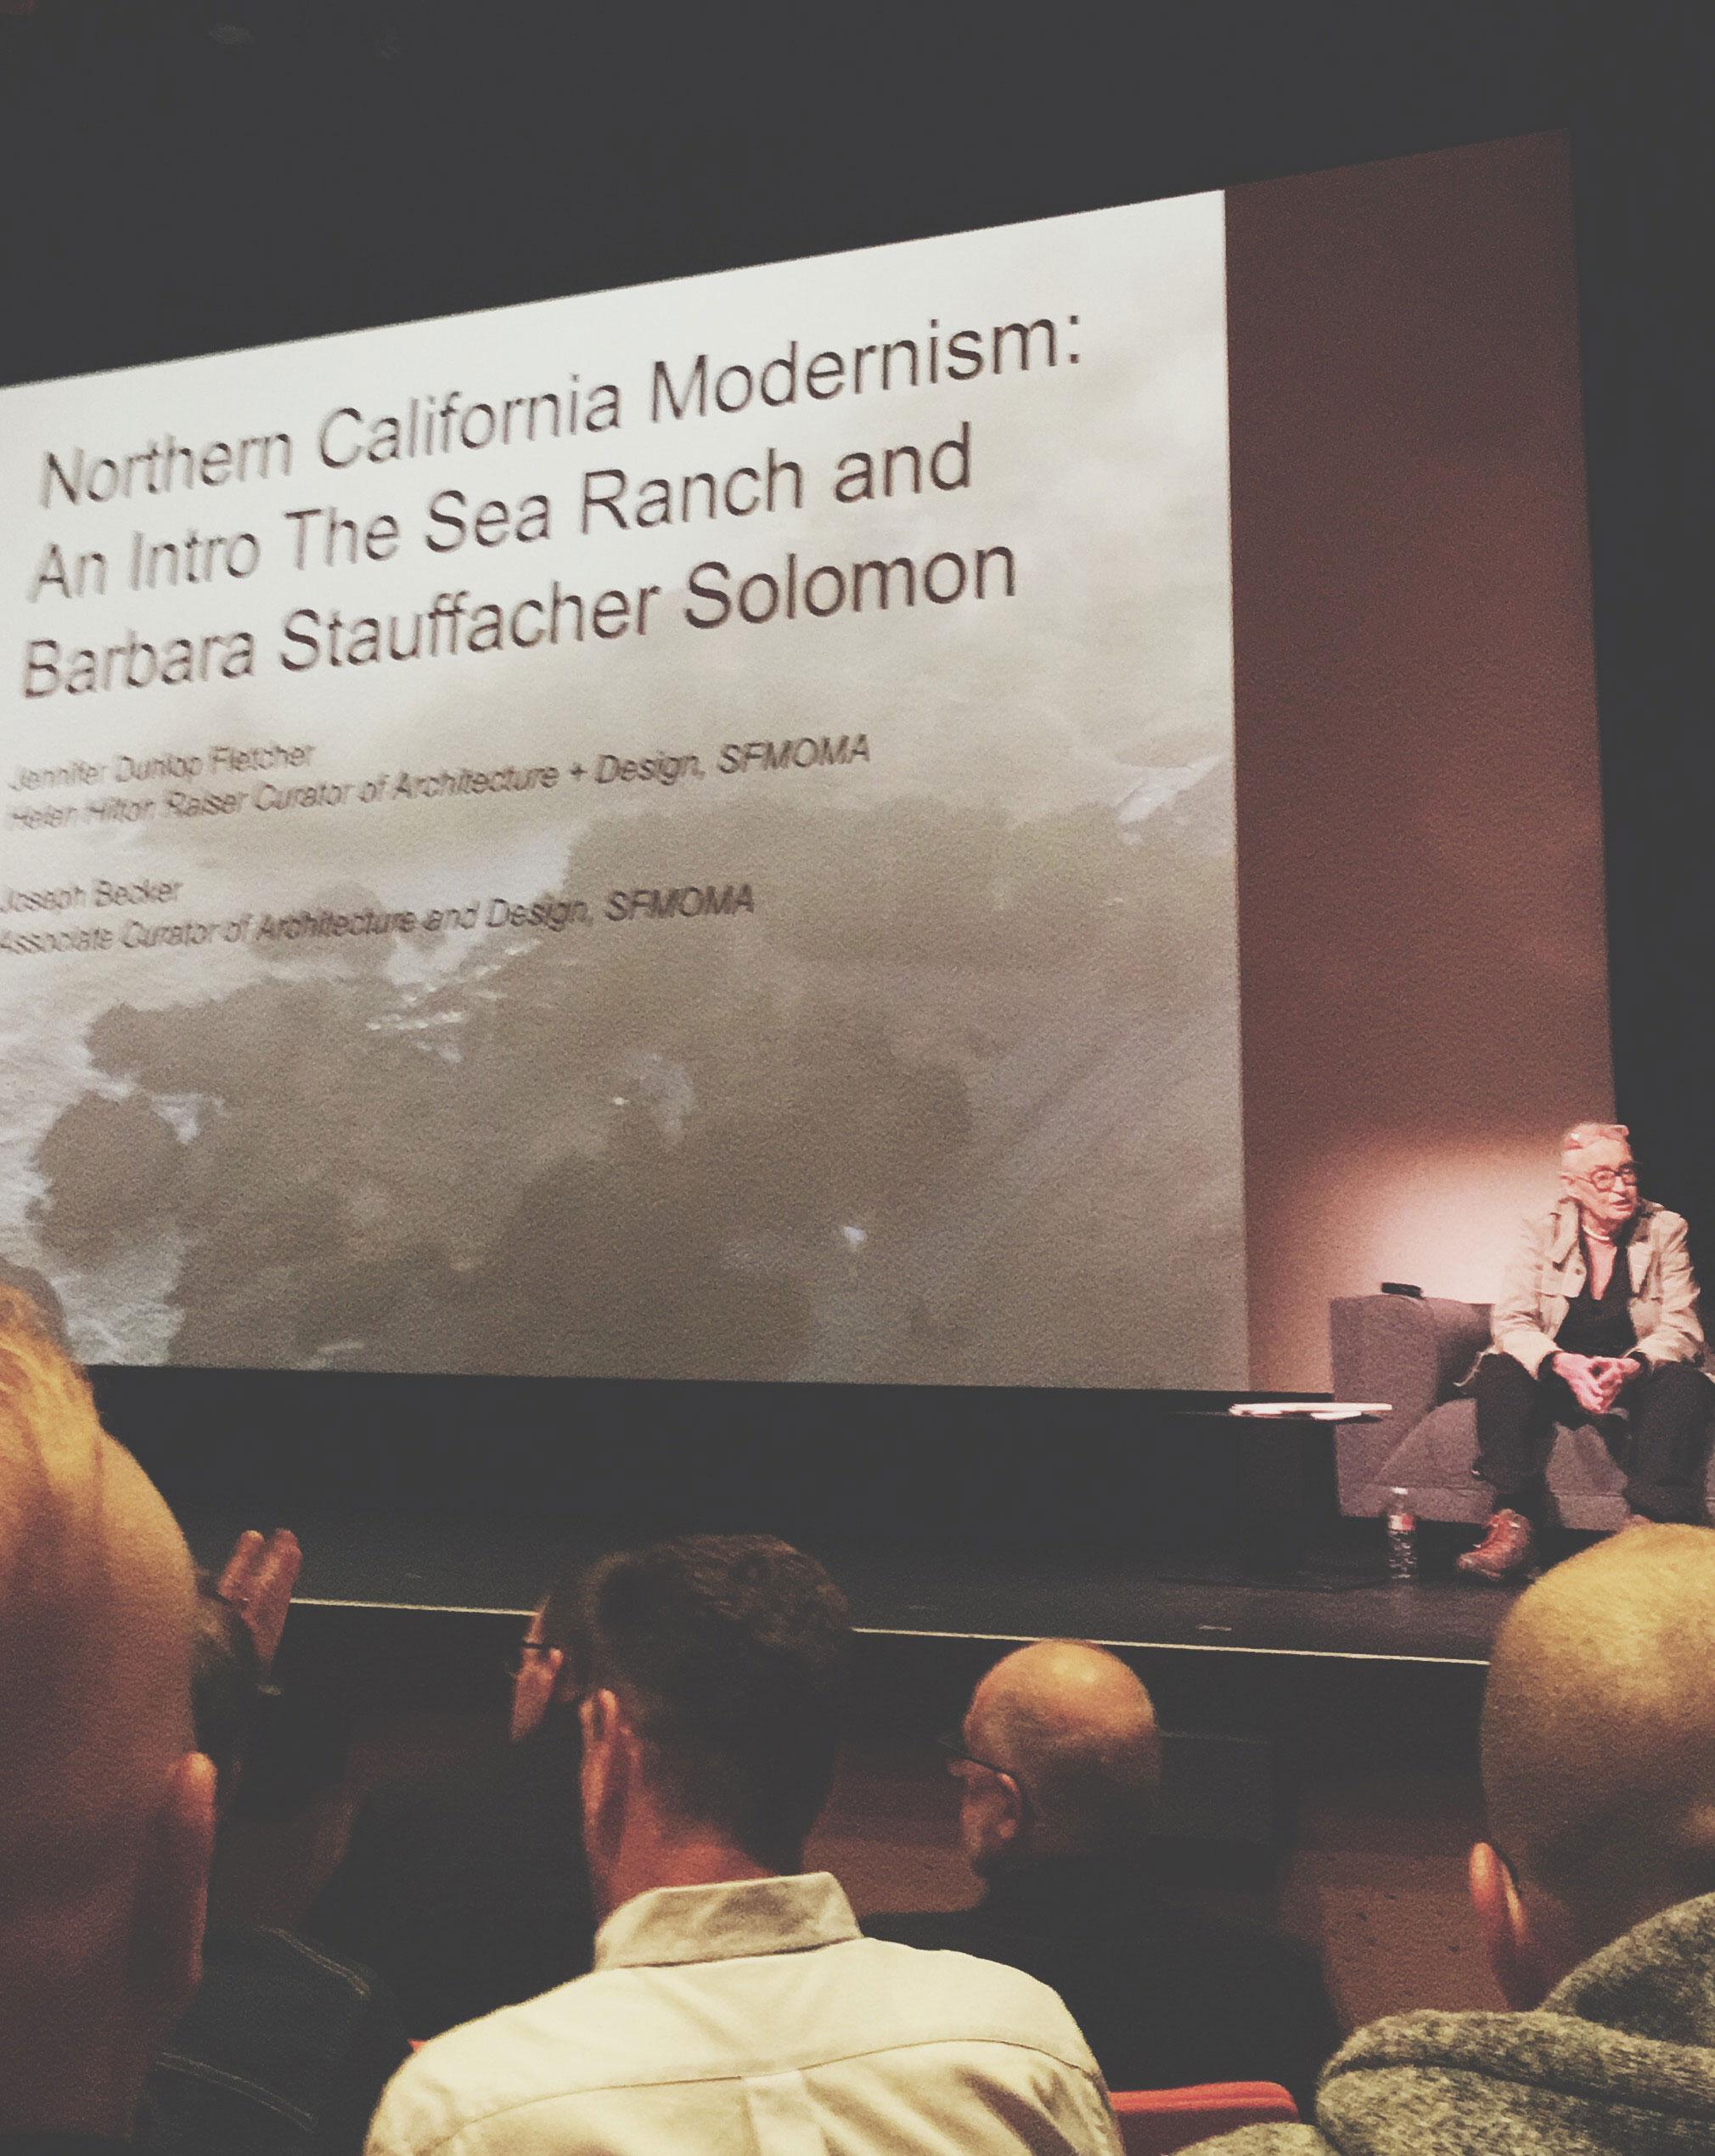 Northern California Modernism